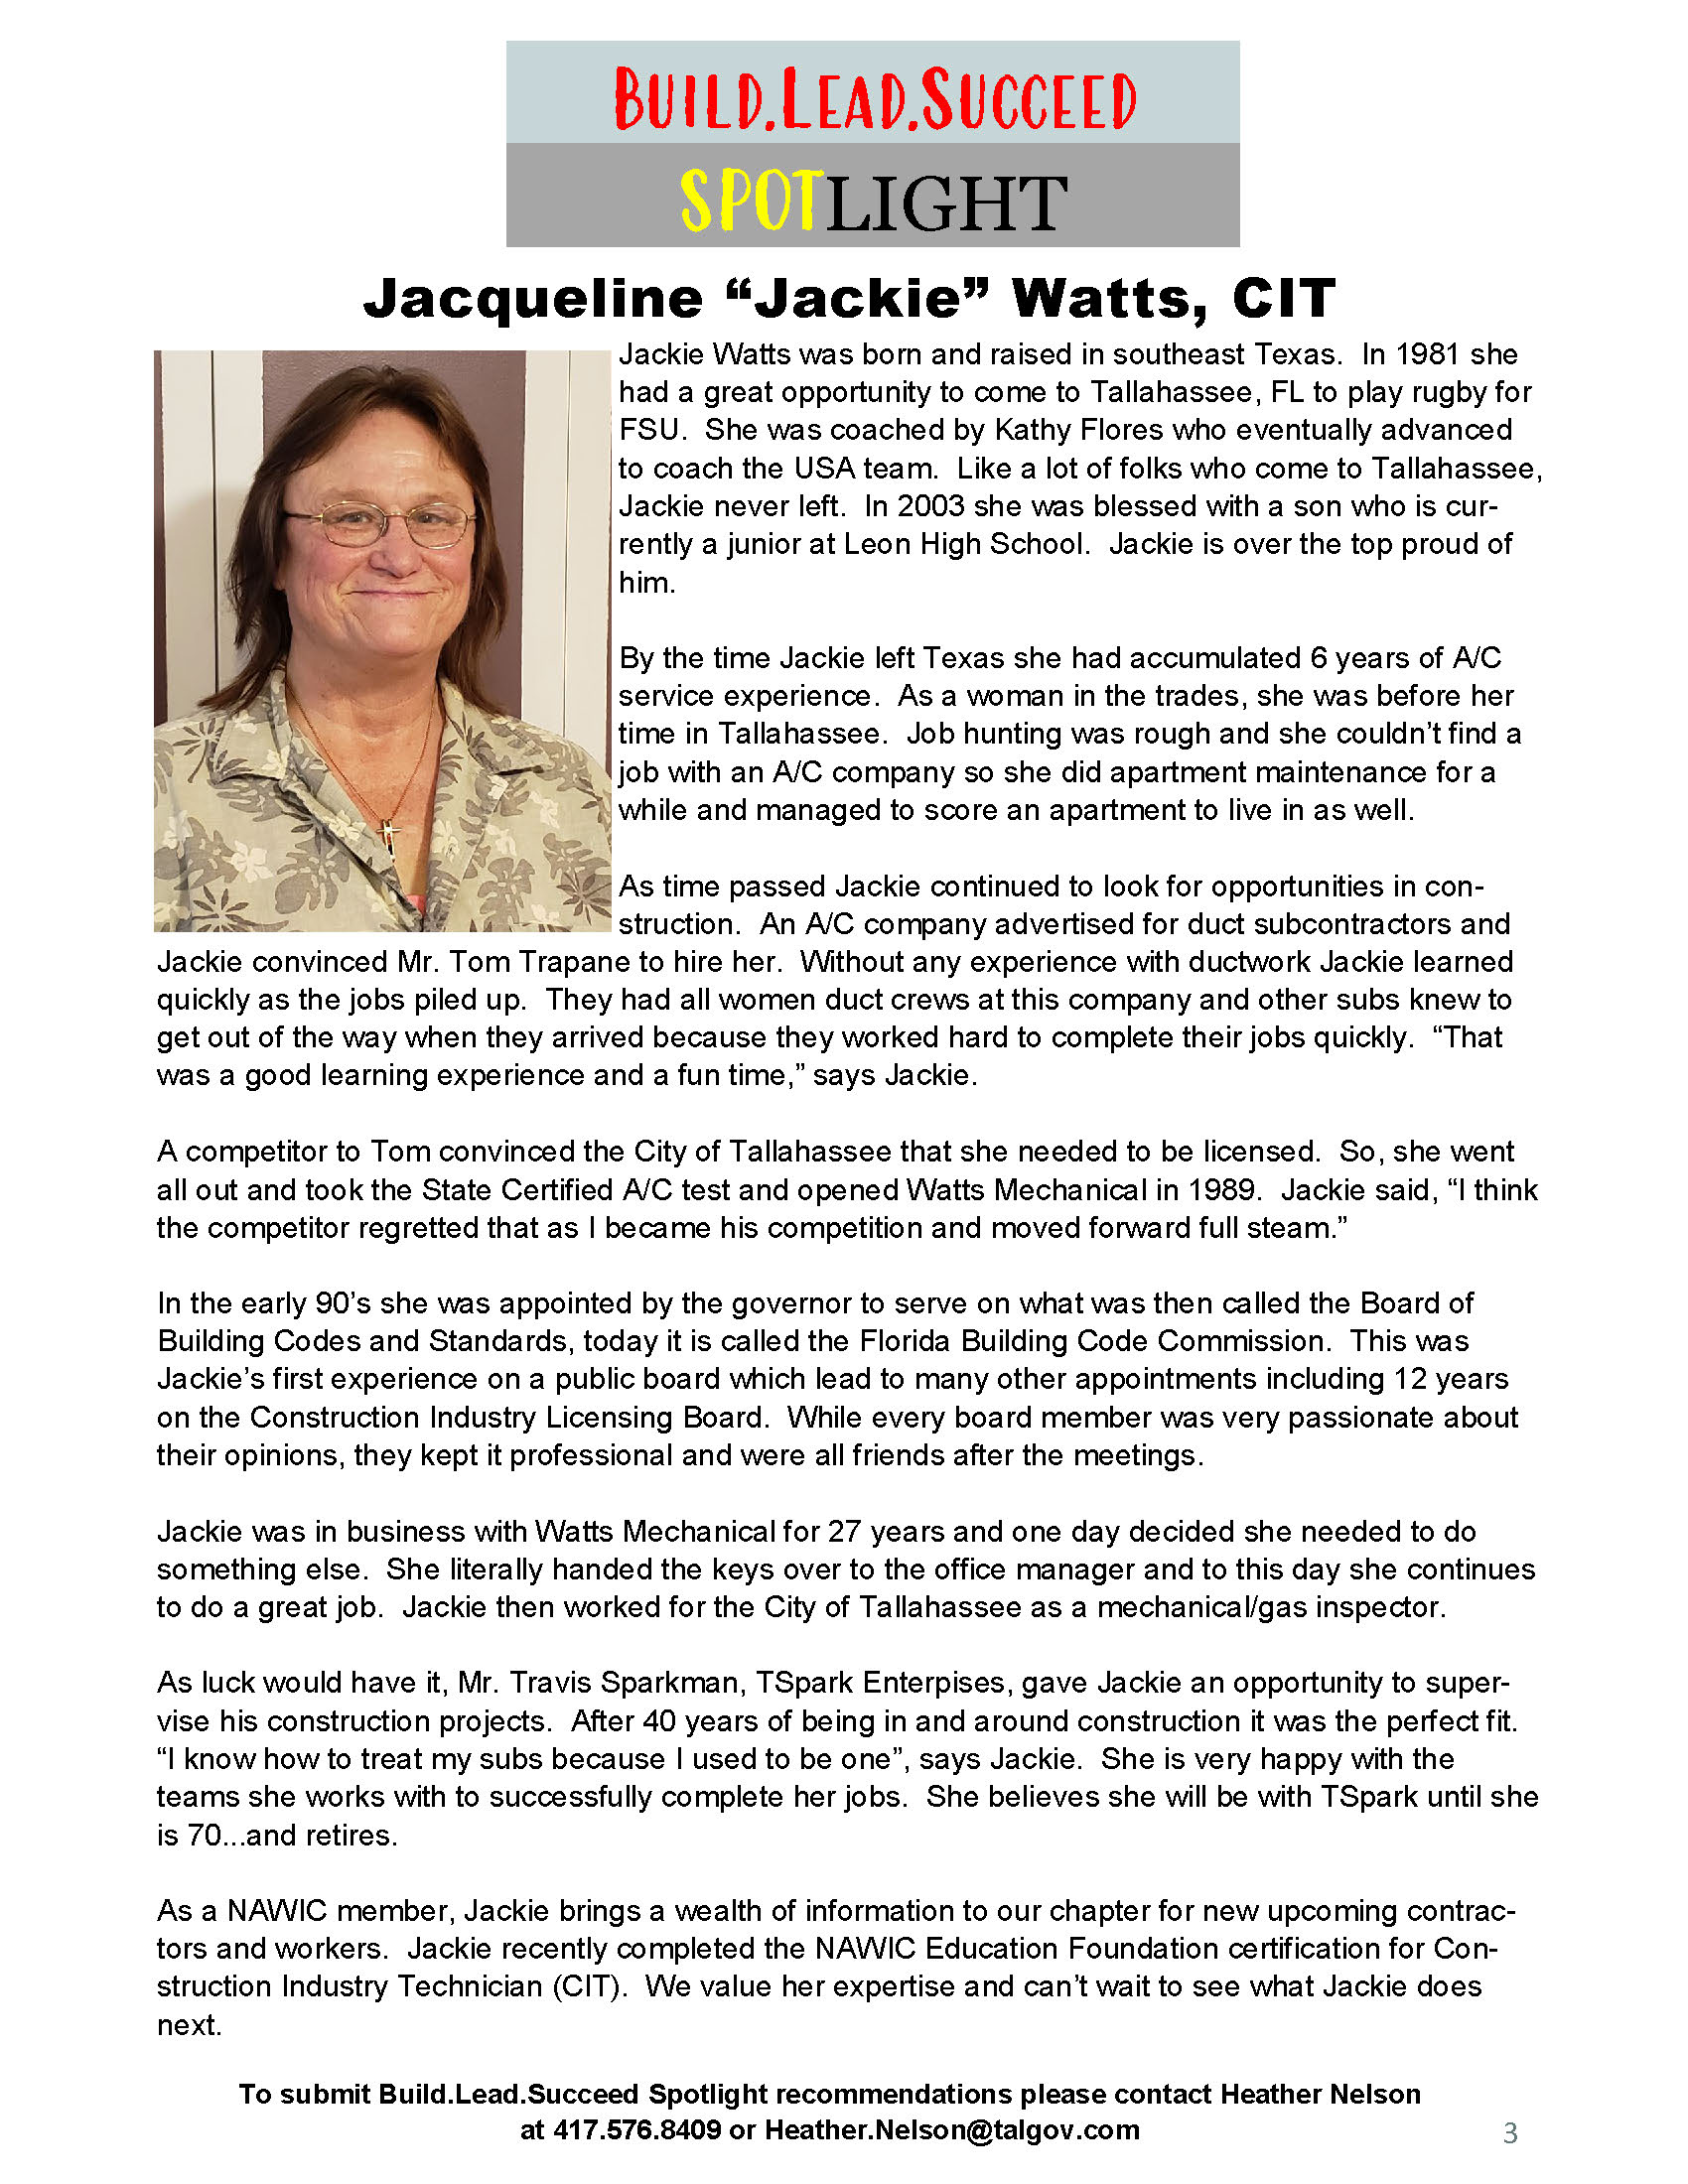 Spotlight: Jackie Watts